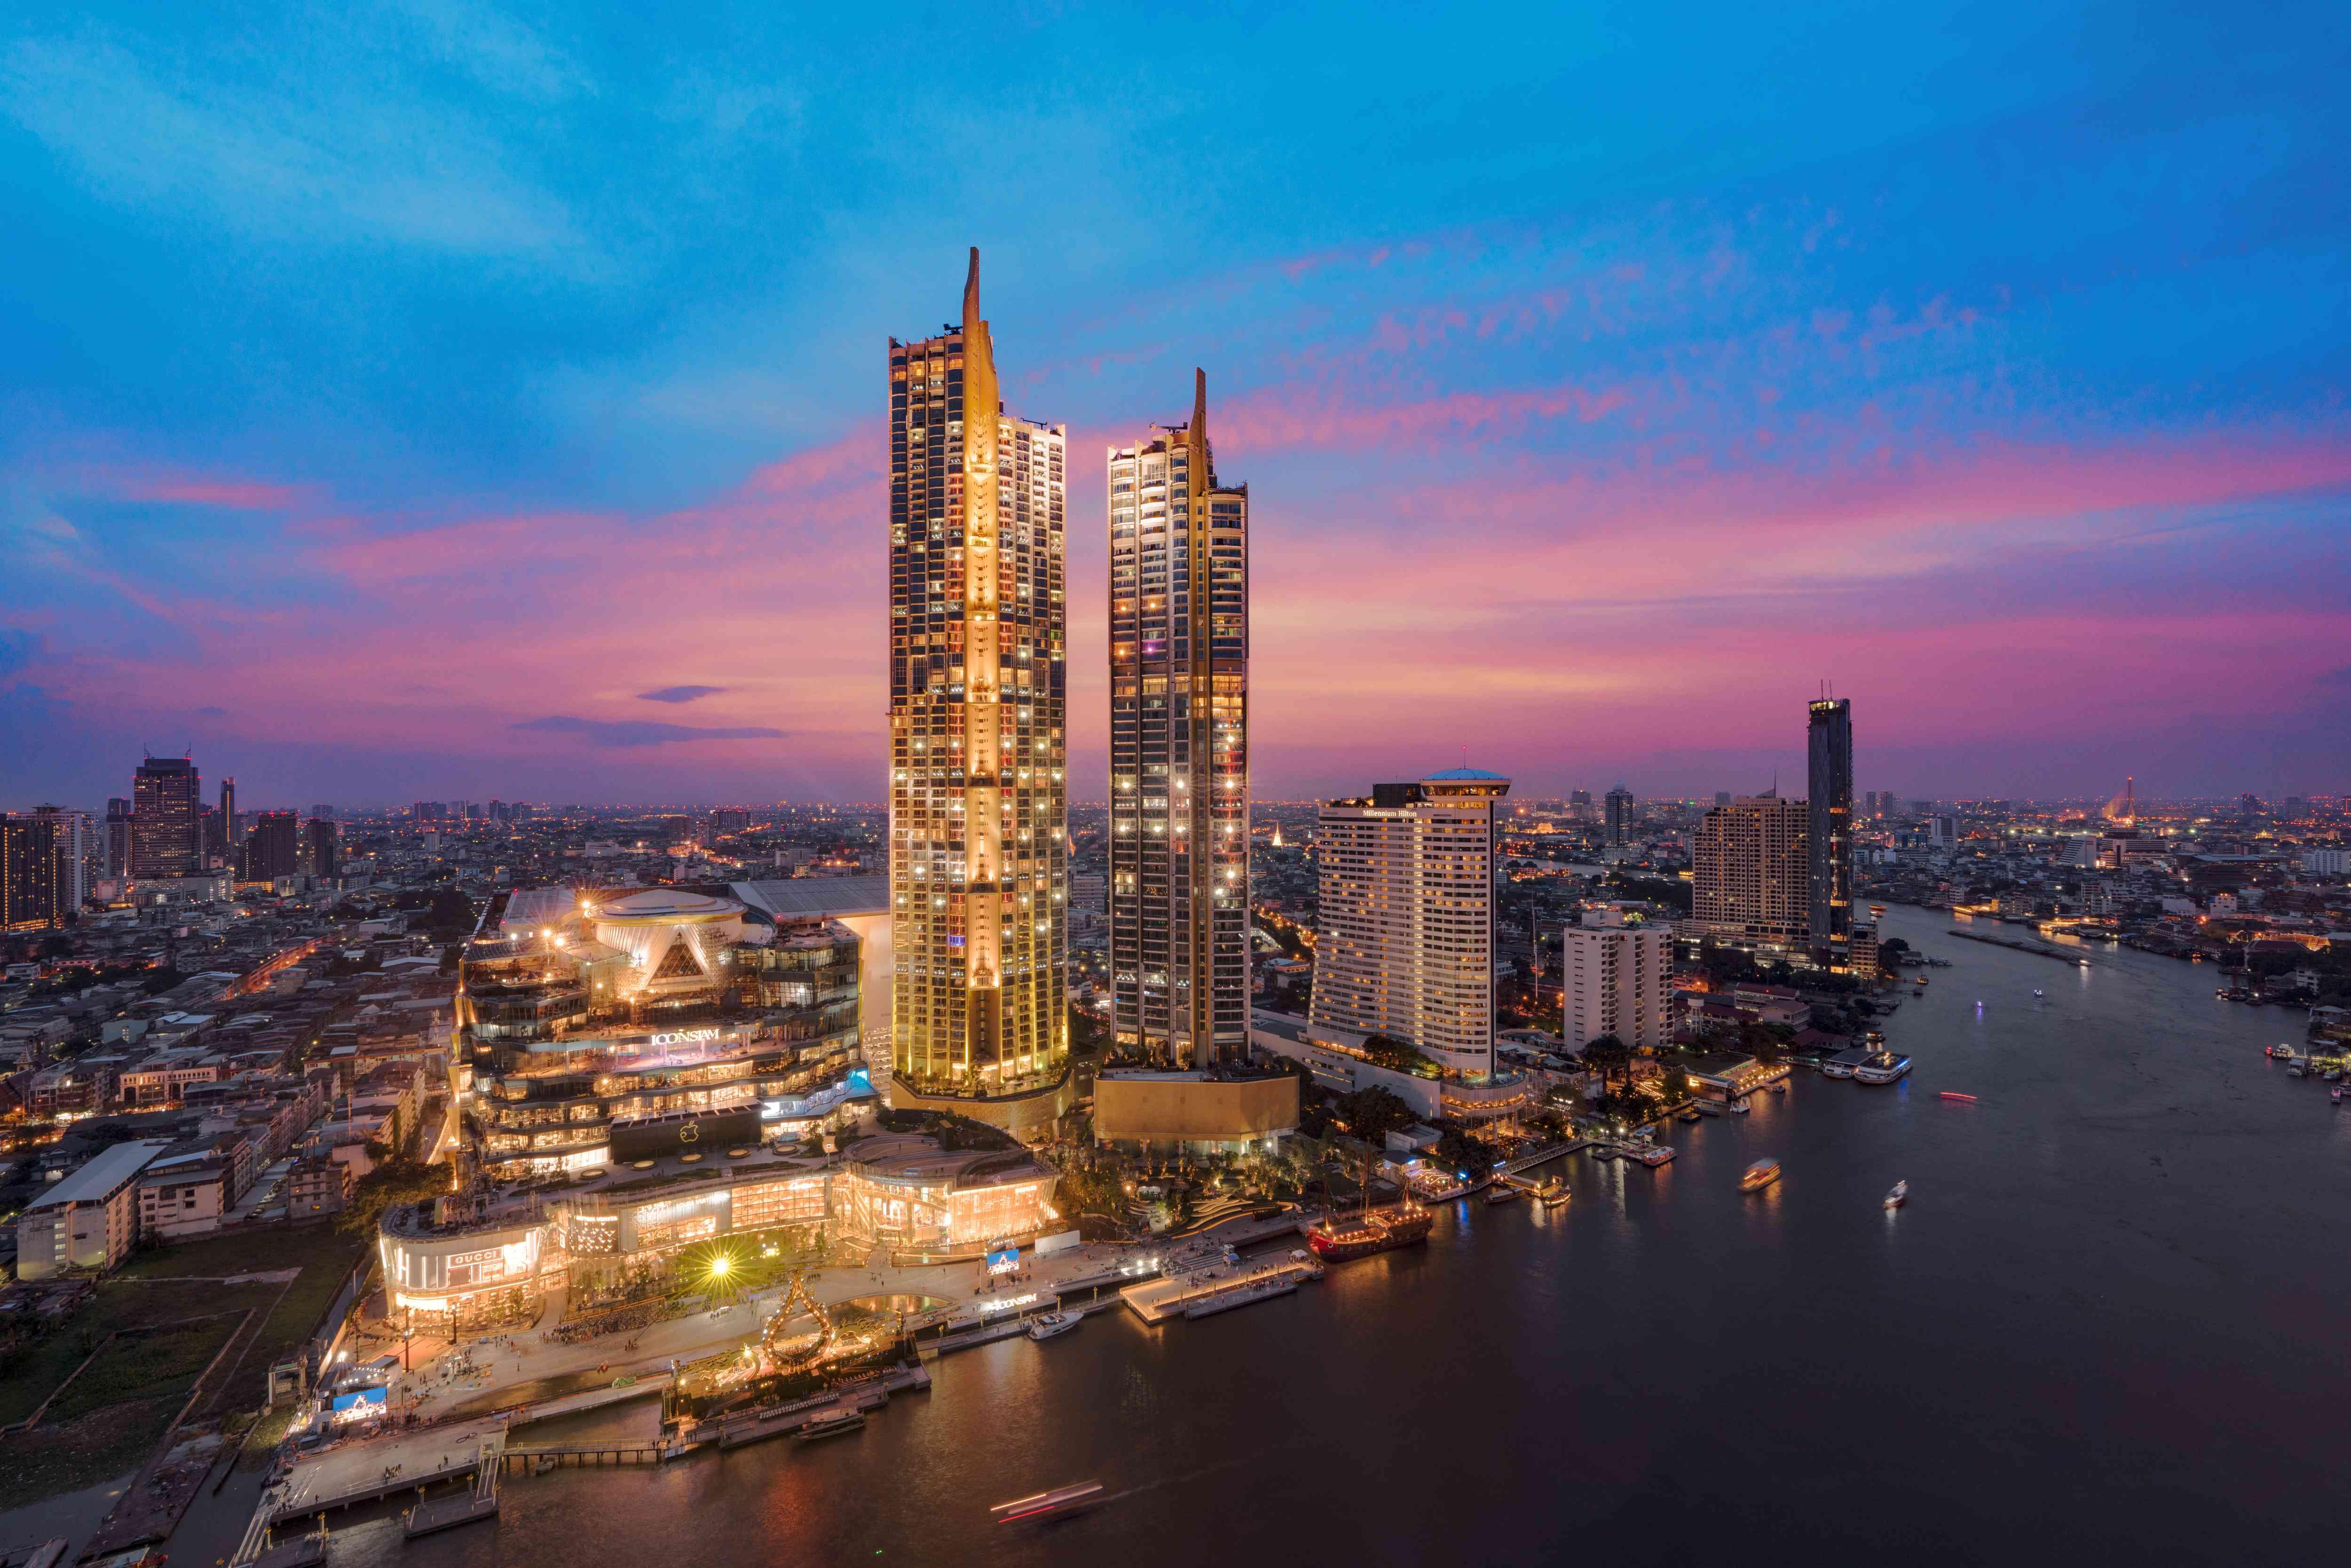 IconSIAM in Bangkok at sunset